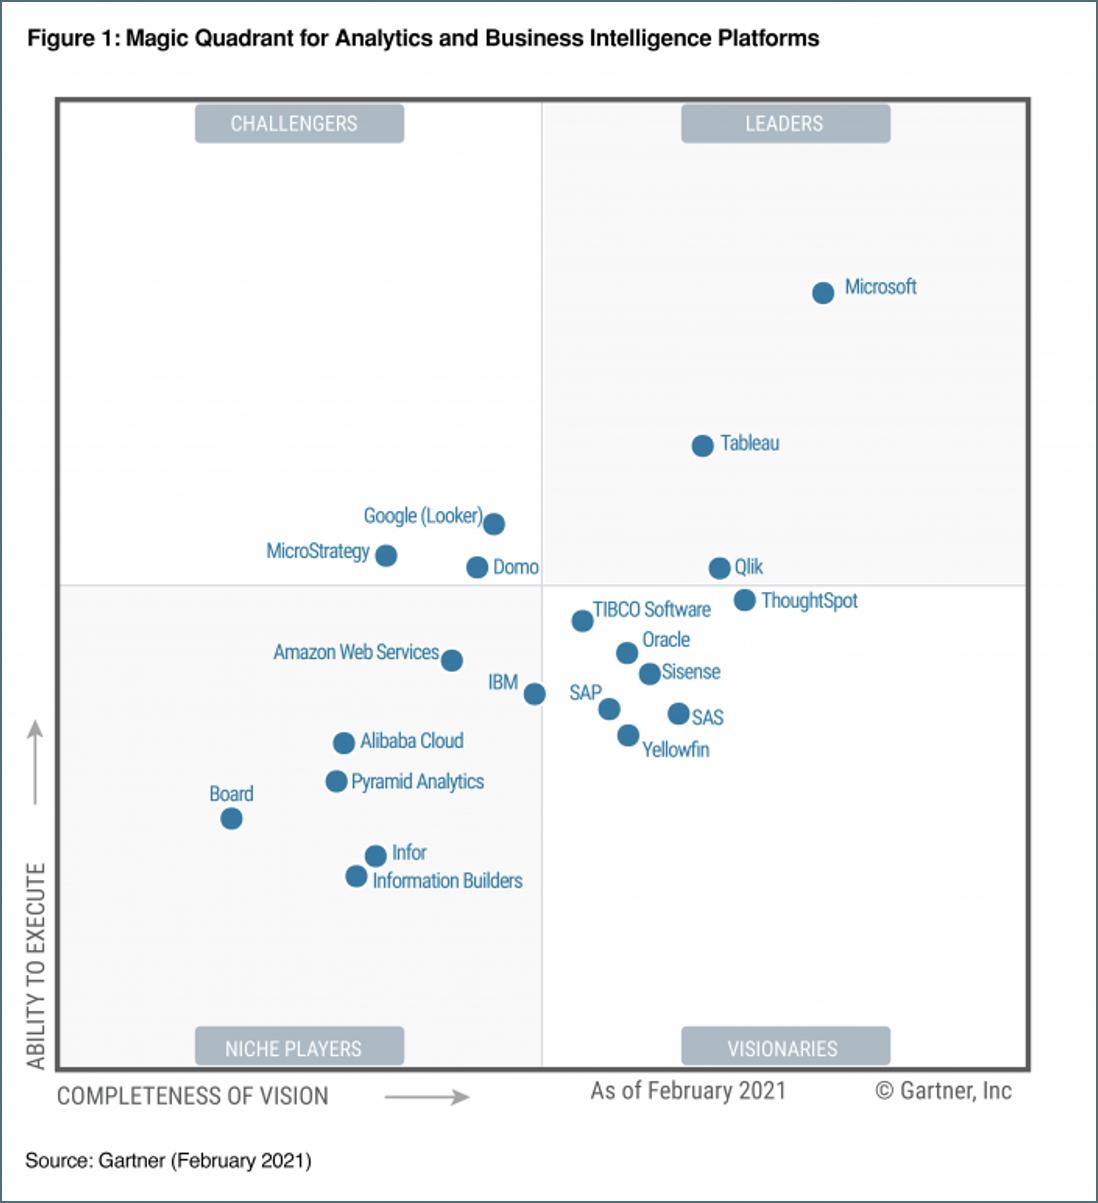 Magic Quadrant for Analytics and Business Intelligence Platforms